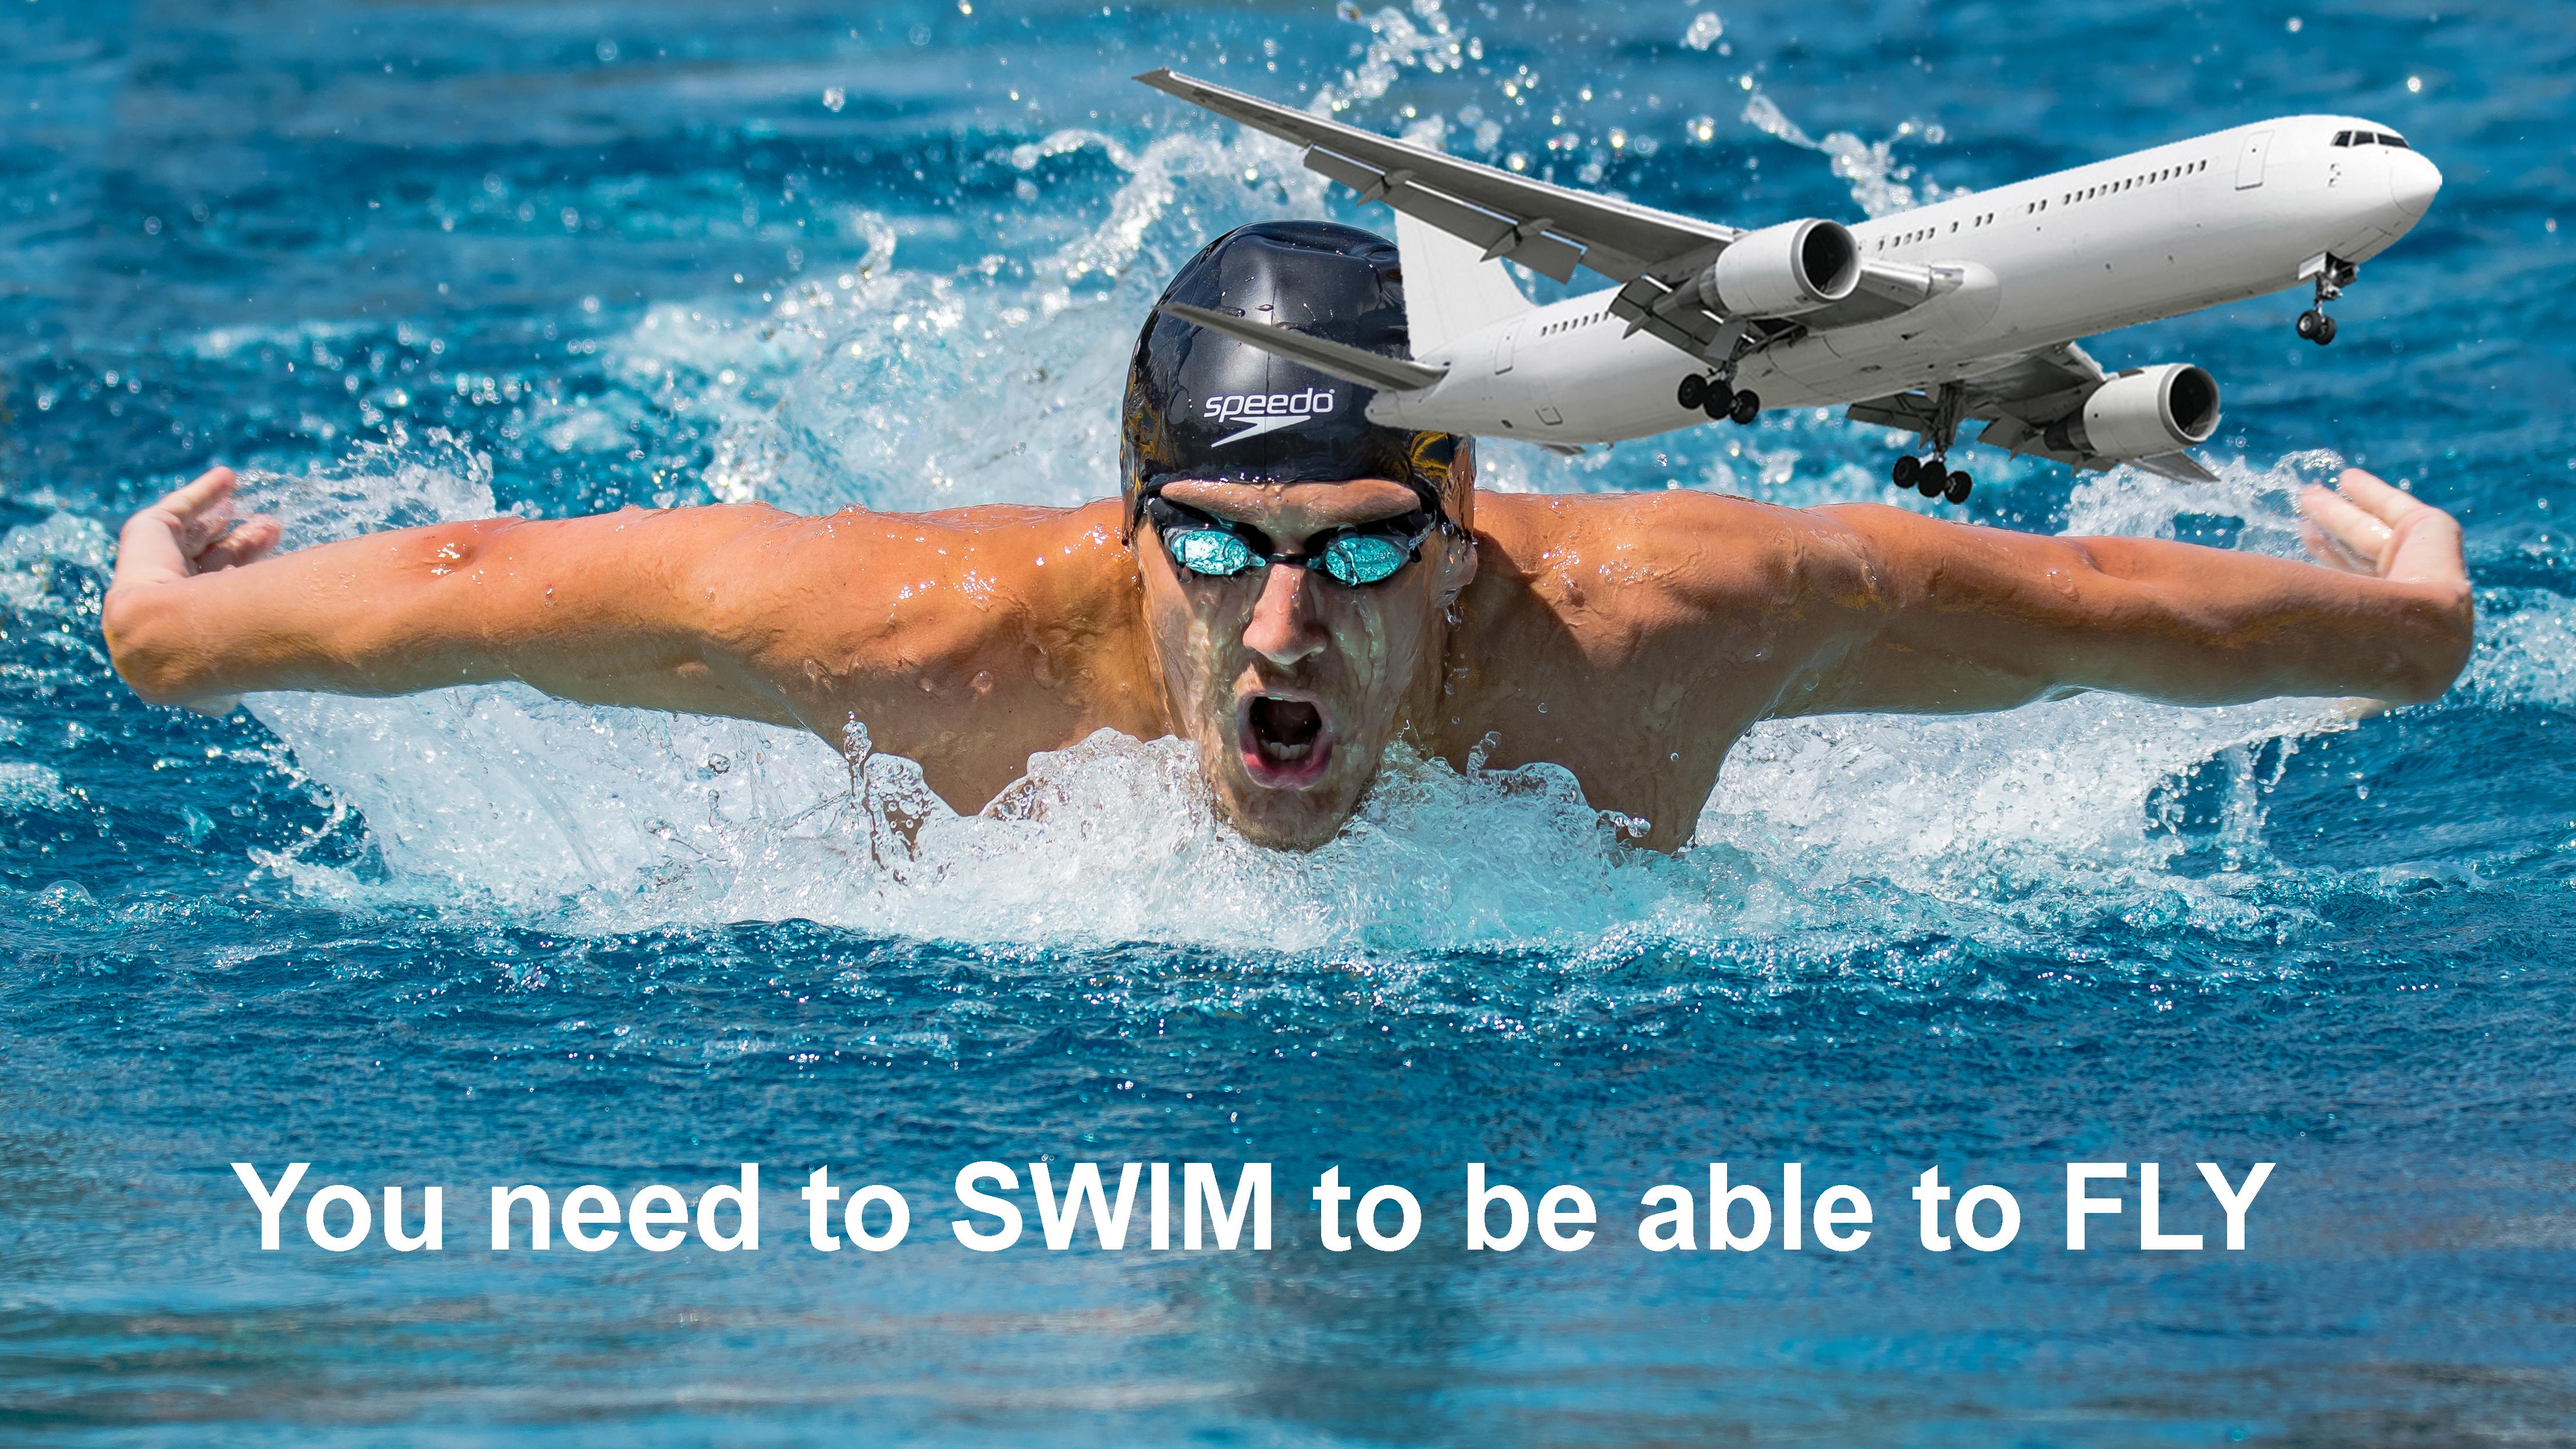 https://cloud-2c5lw5ook.vercel.app/040._schwimmzonen-_und_mastersmeeting_enns_2017_100m_butterfly-9318.png